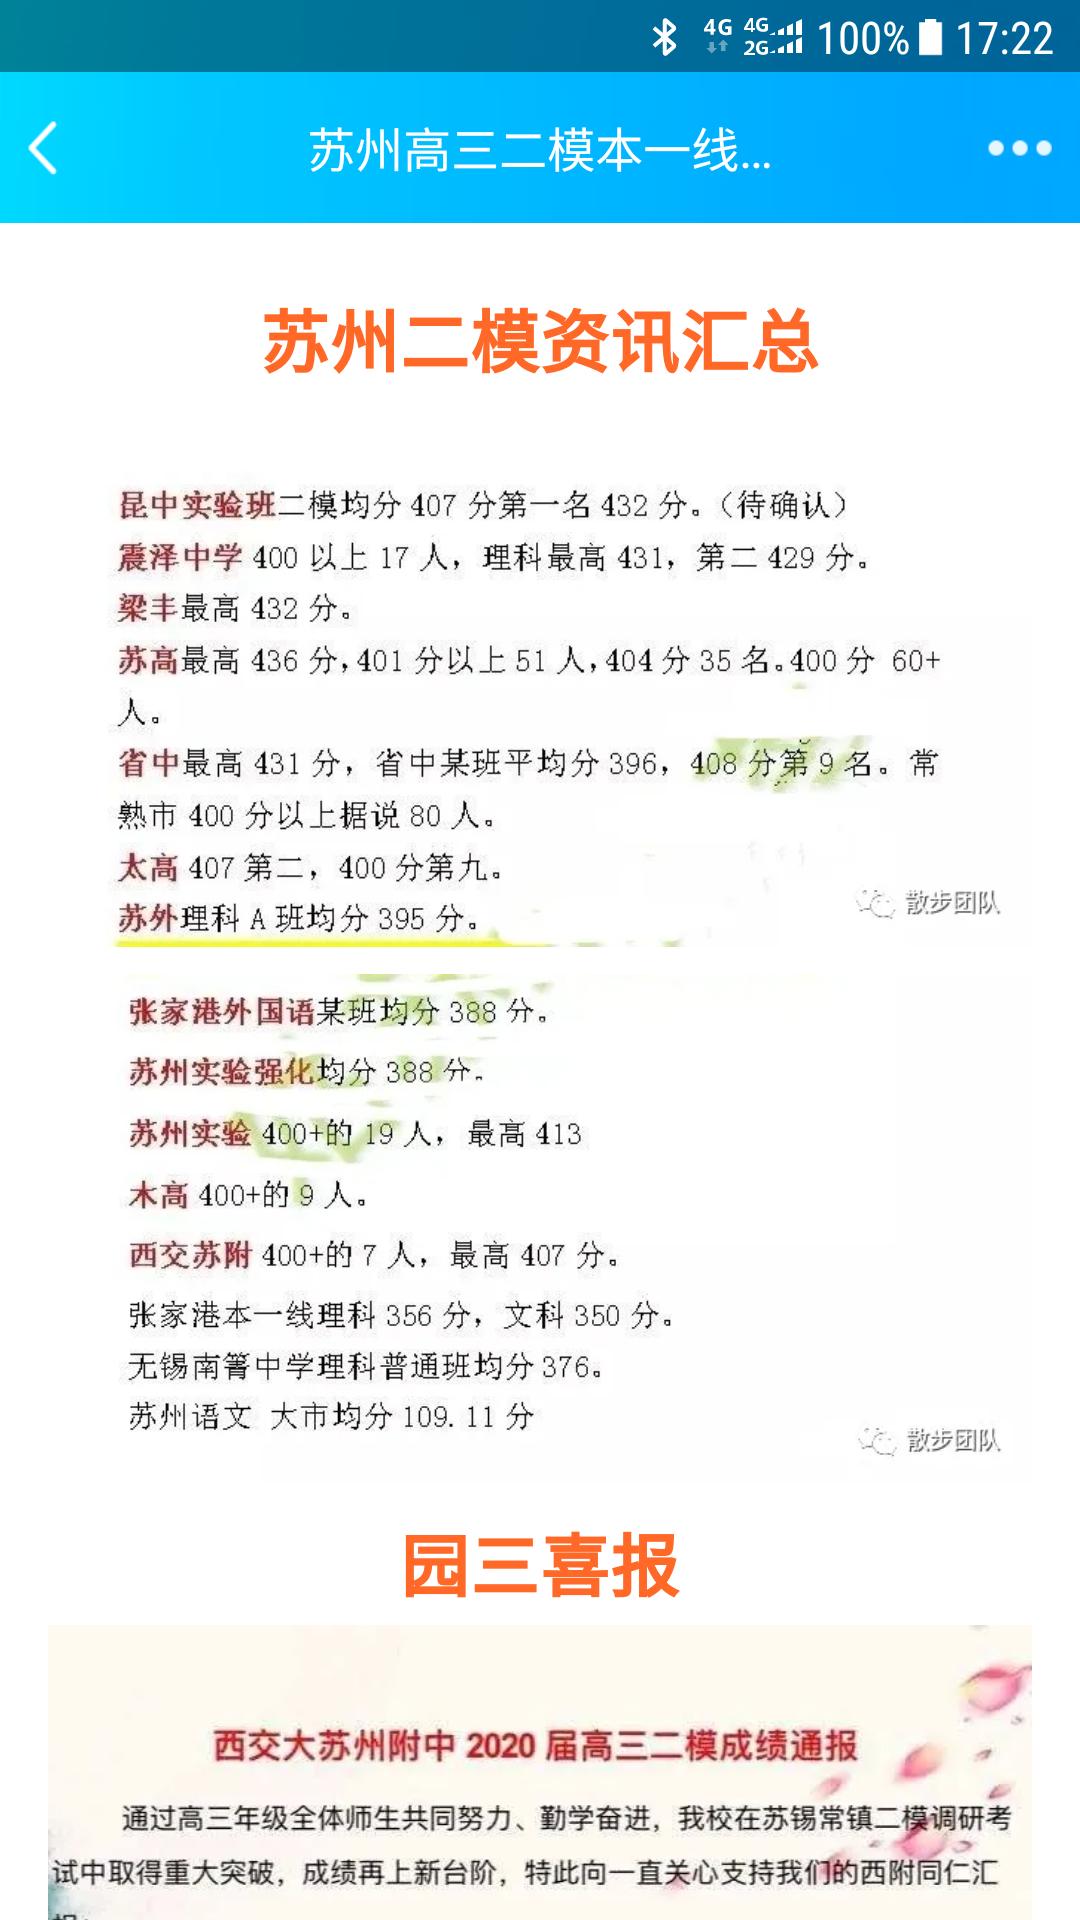 Screenshot_20200529-172217.png